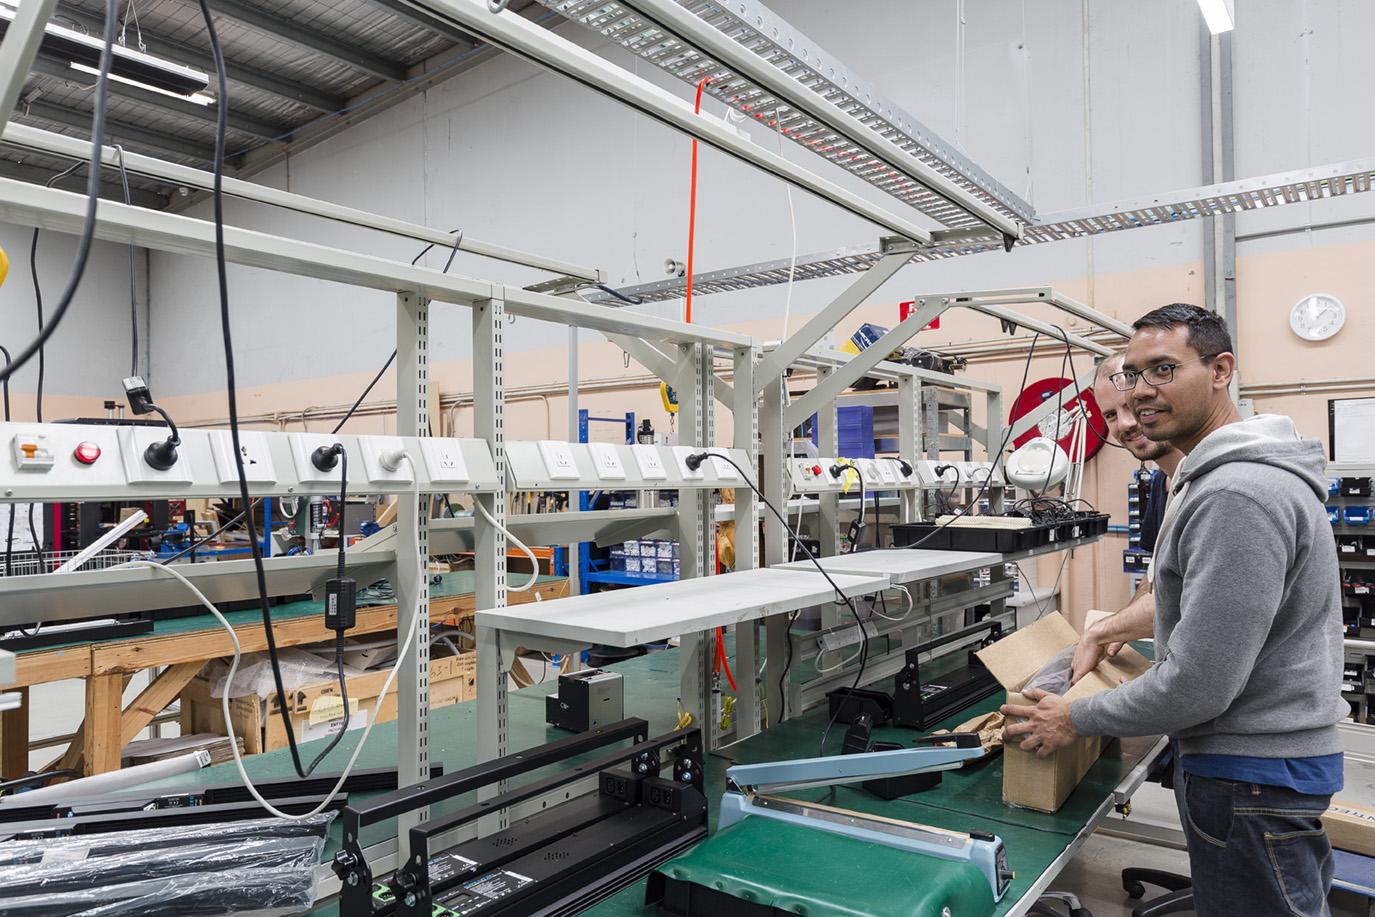 ENTTEC_Factory Images_183.jpg